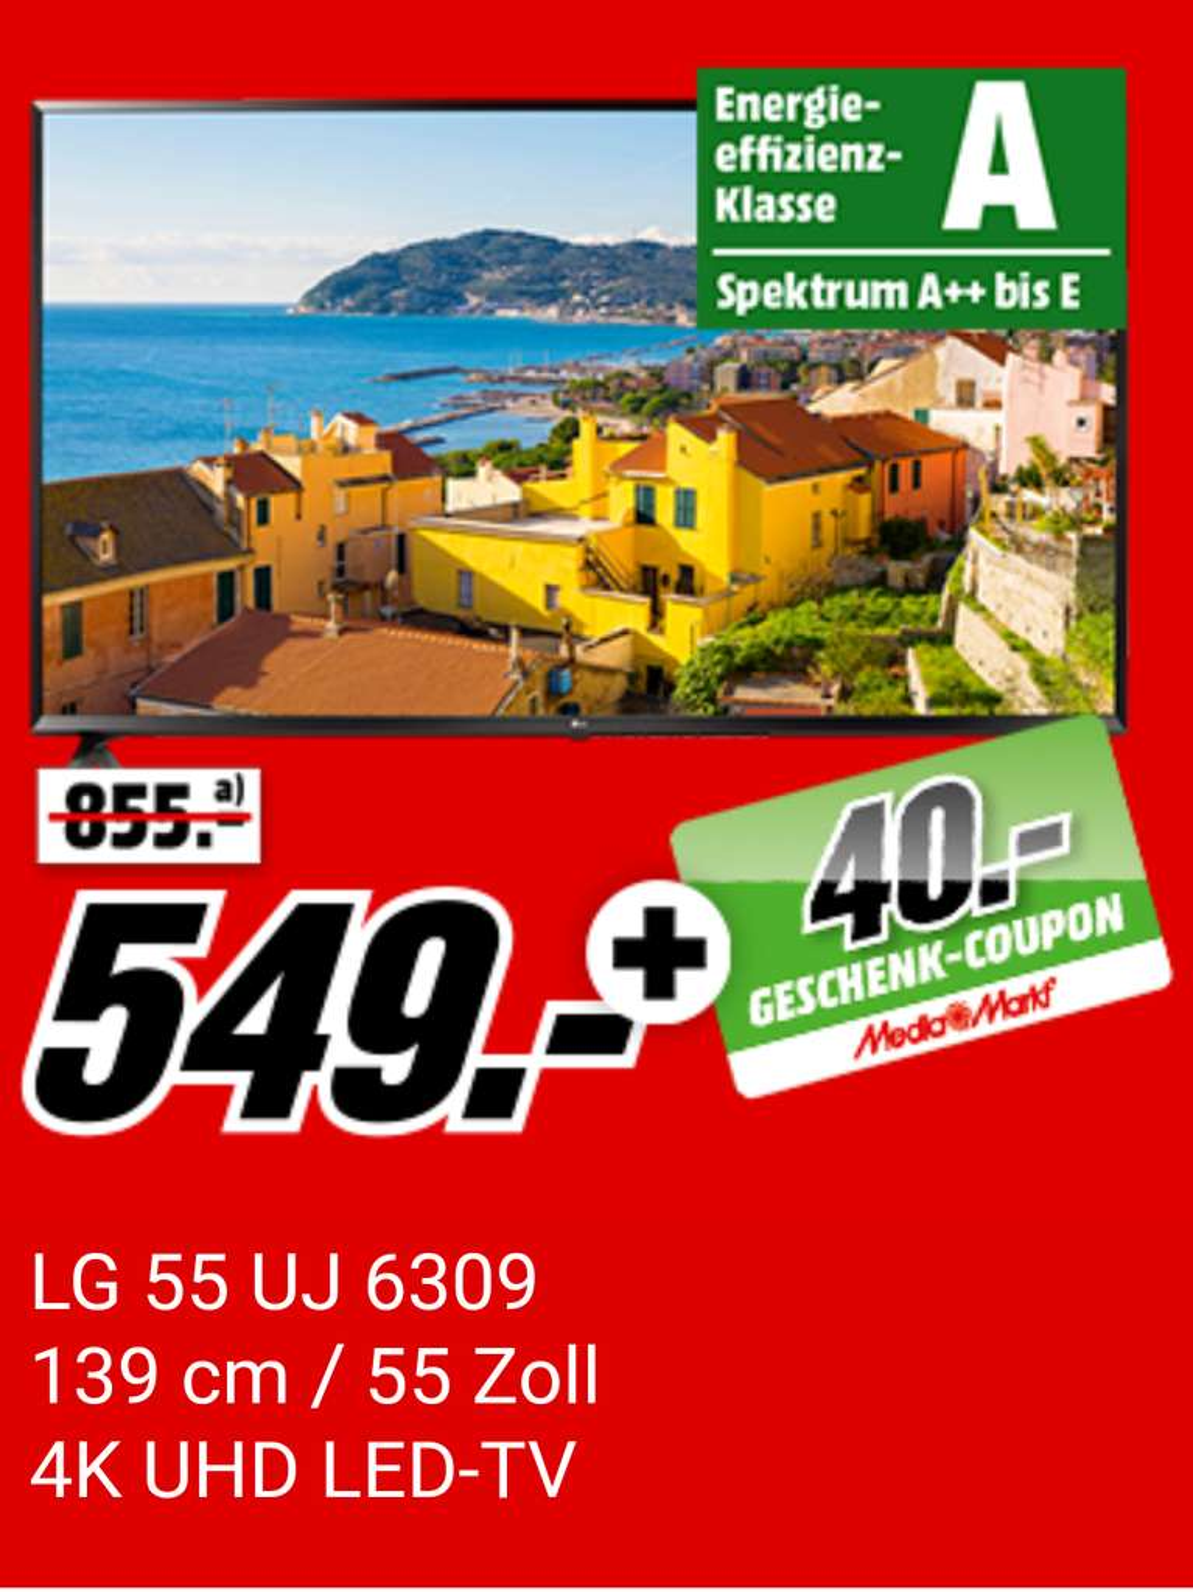 media markt lg 55uj6309 tv 55zoll 549 euro 40 euro coupon statt 679 euro. Black Bedroom Furniture Sets. Home Design Ideas